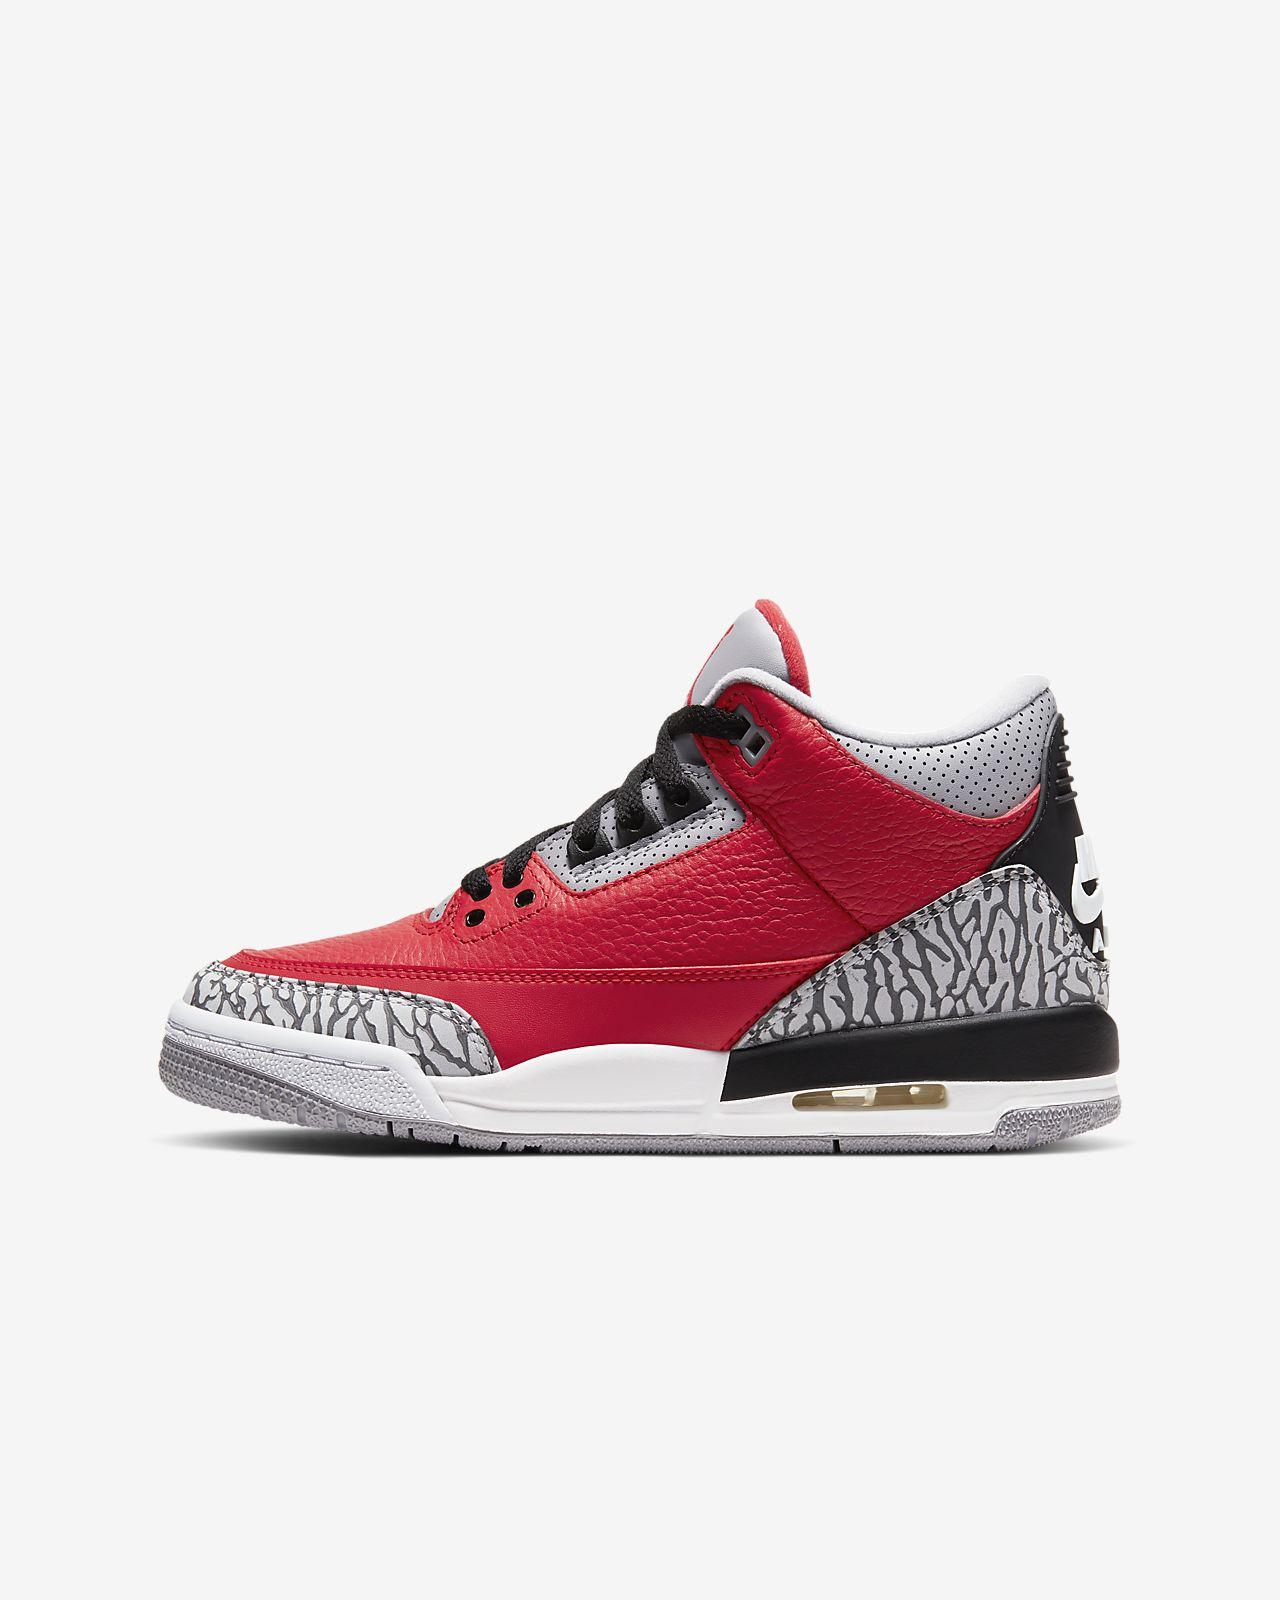 Air Jordan 3 x Nike Air Max 1